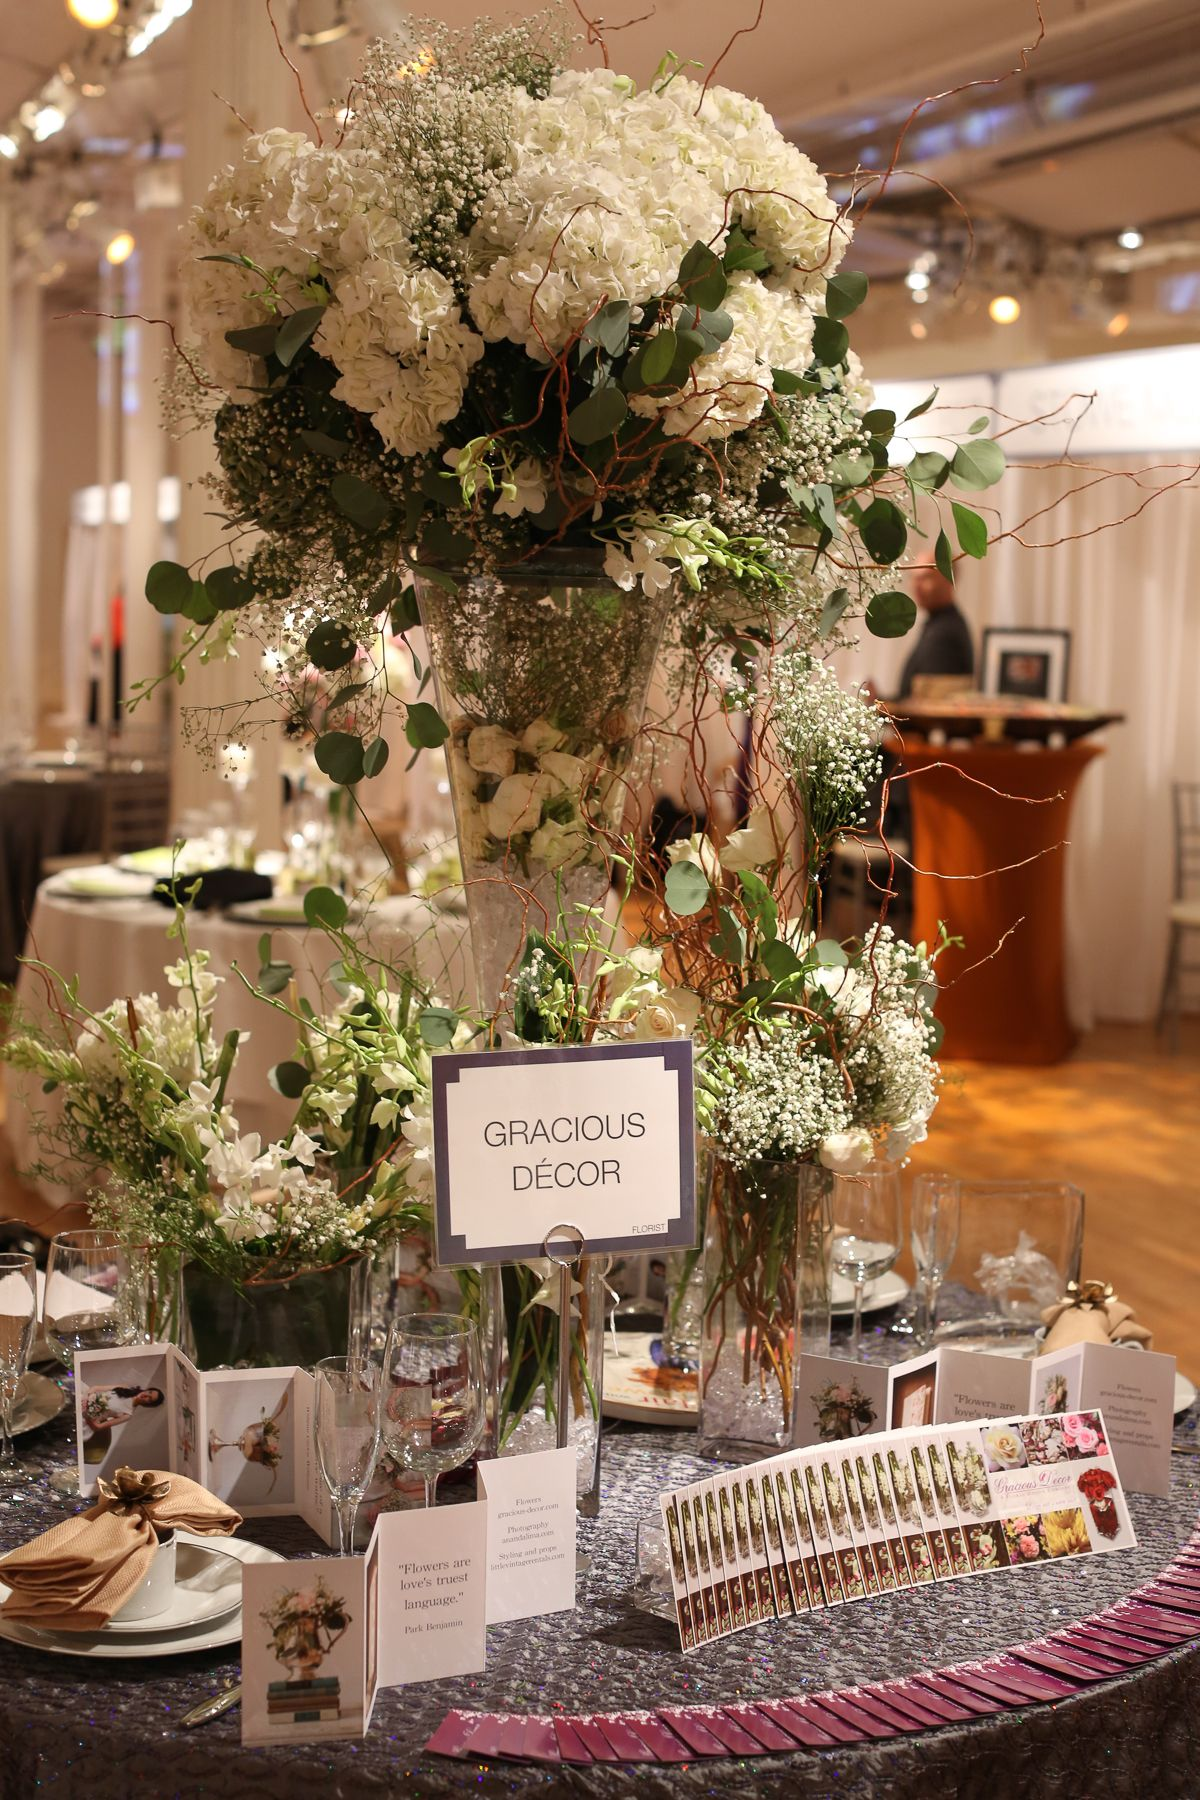 Stunning centerpiece from Gracious Decor at #WeddingSalon